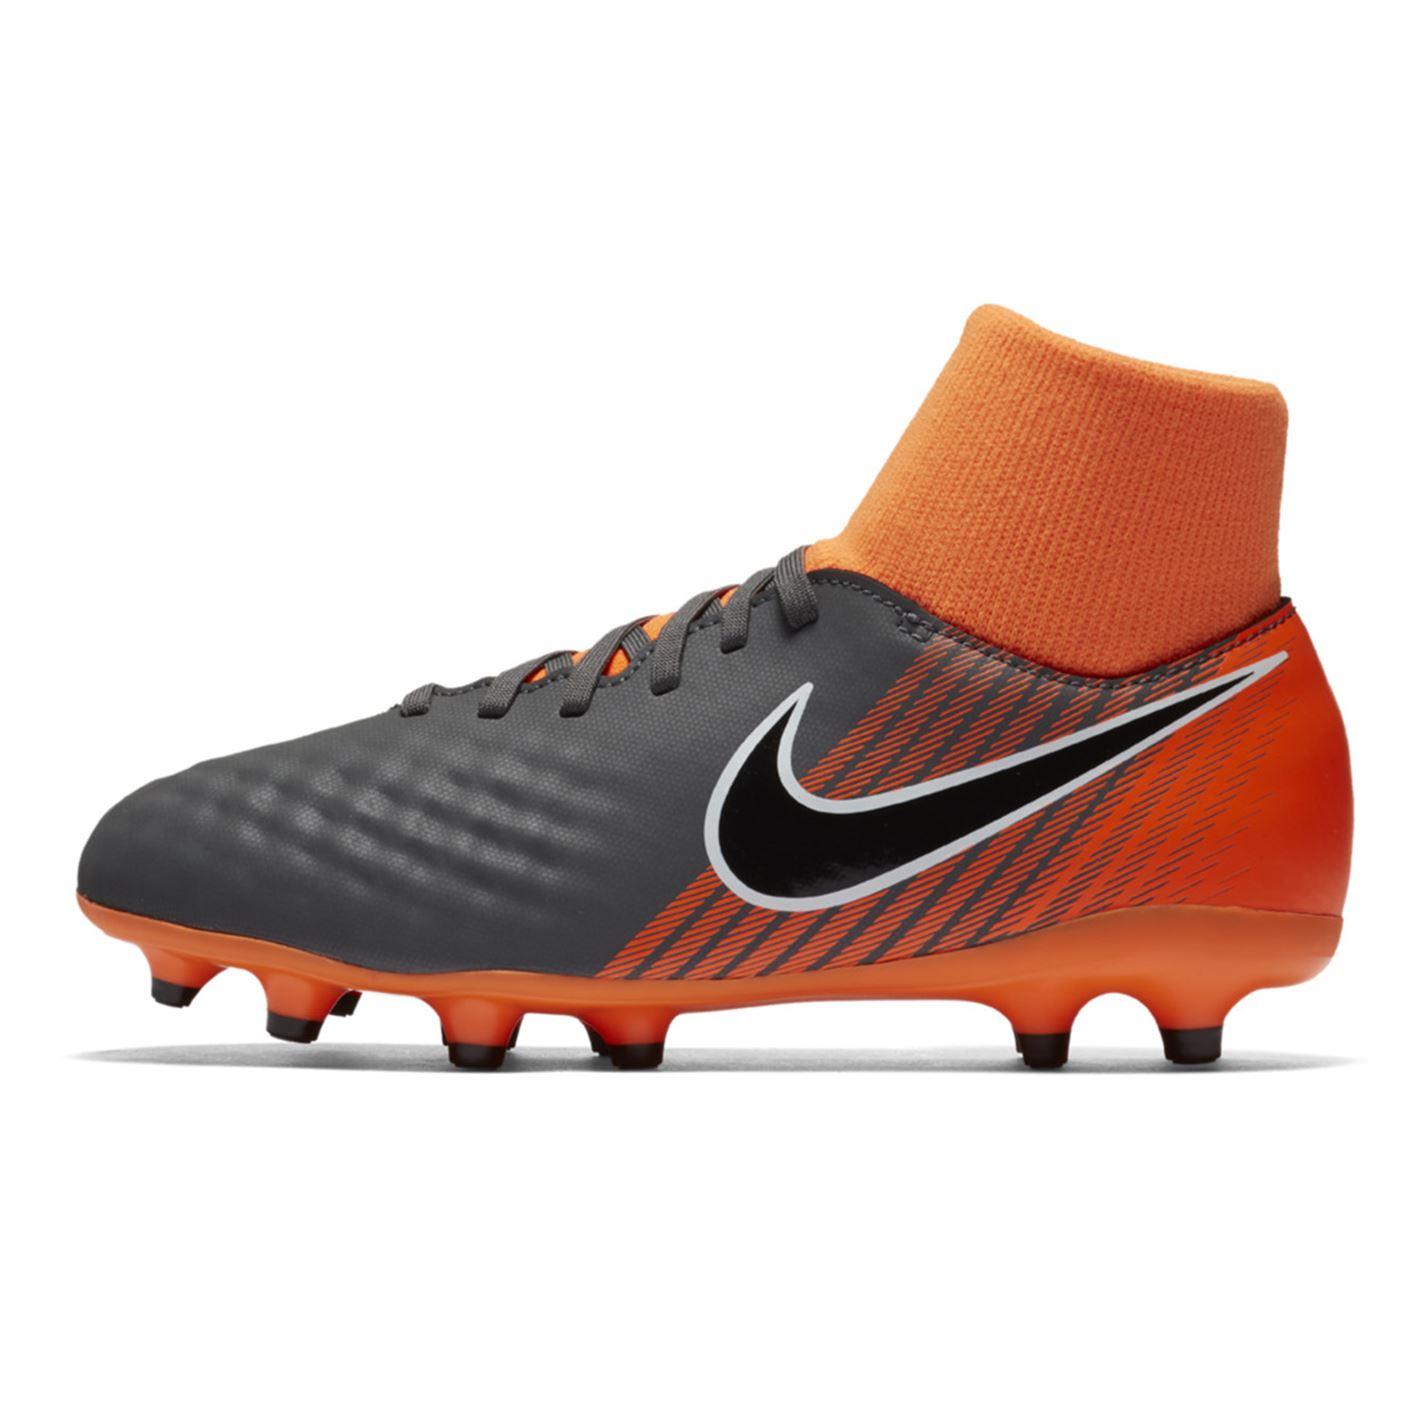 Nike Magista Obra Academy DF Junior FG Football Boots